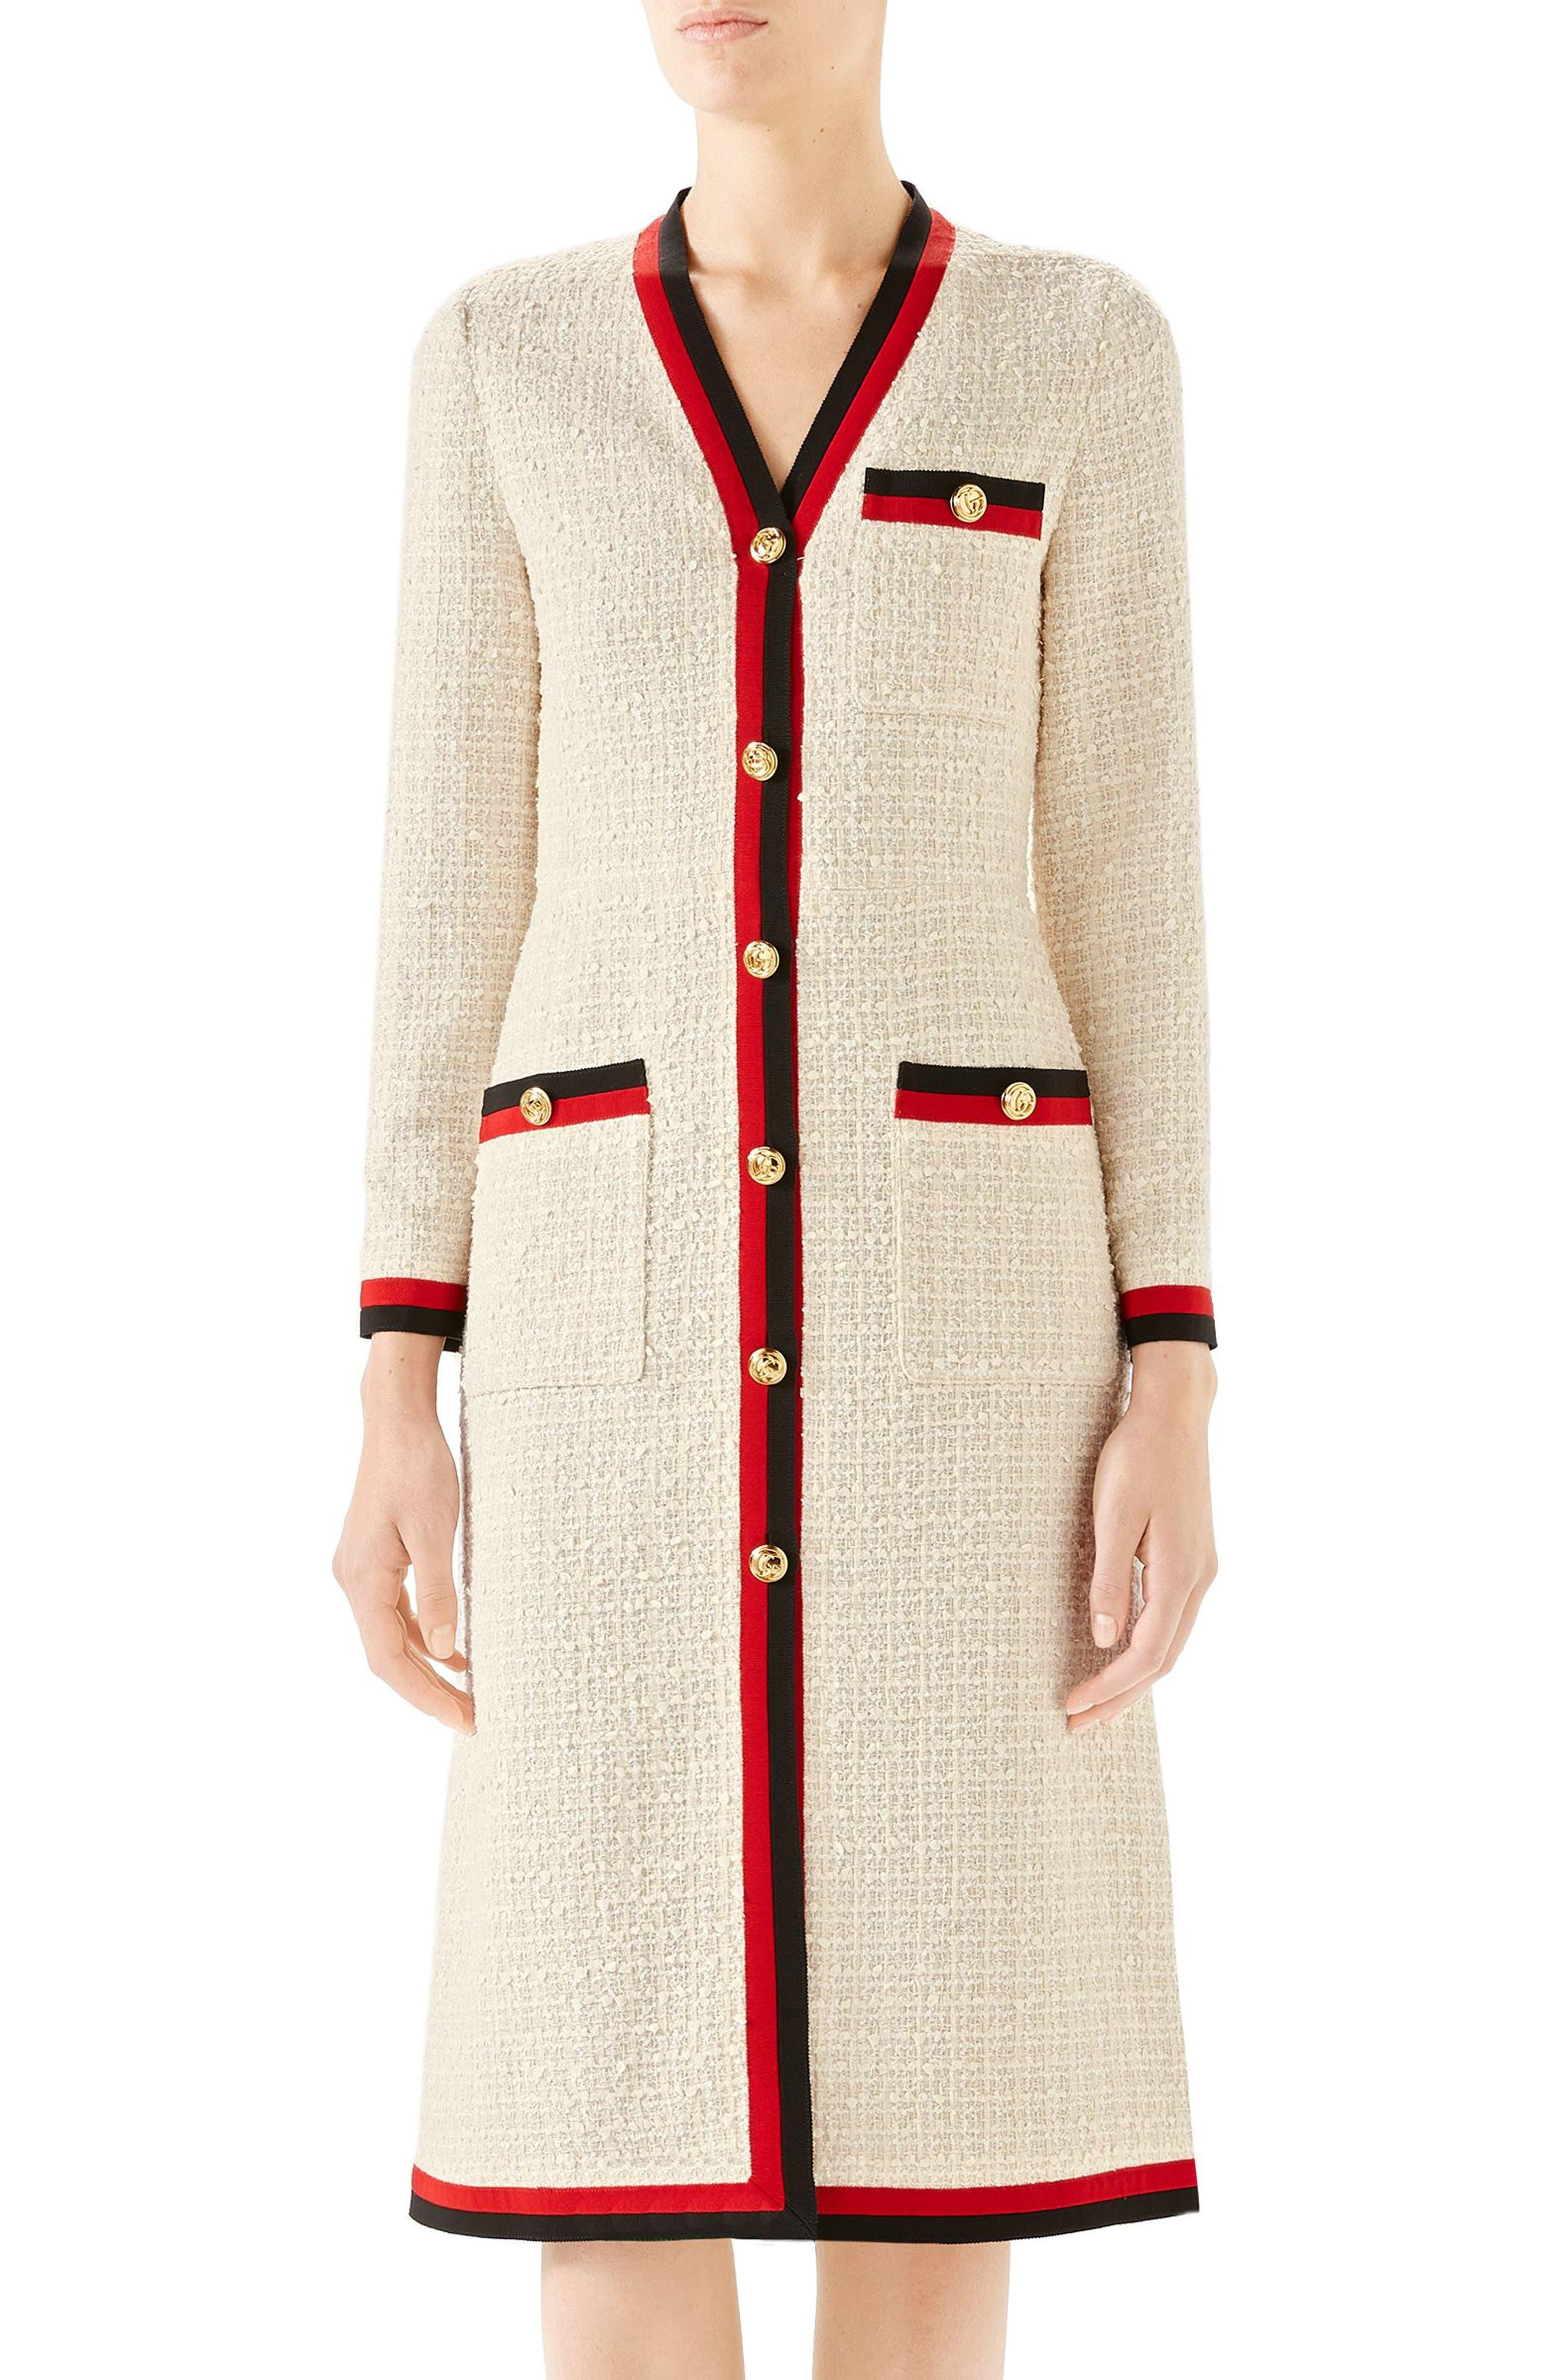 Vintage Coats & Jackets | Retro Coats and Jackets Womens Gucci Ribbon Trim Tweed Dress Size 14 US  50 IT - Ivory $3,980.00 AT vintagedancer.com